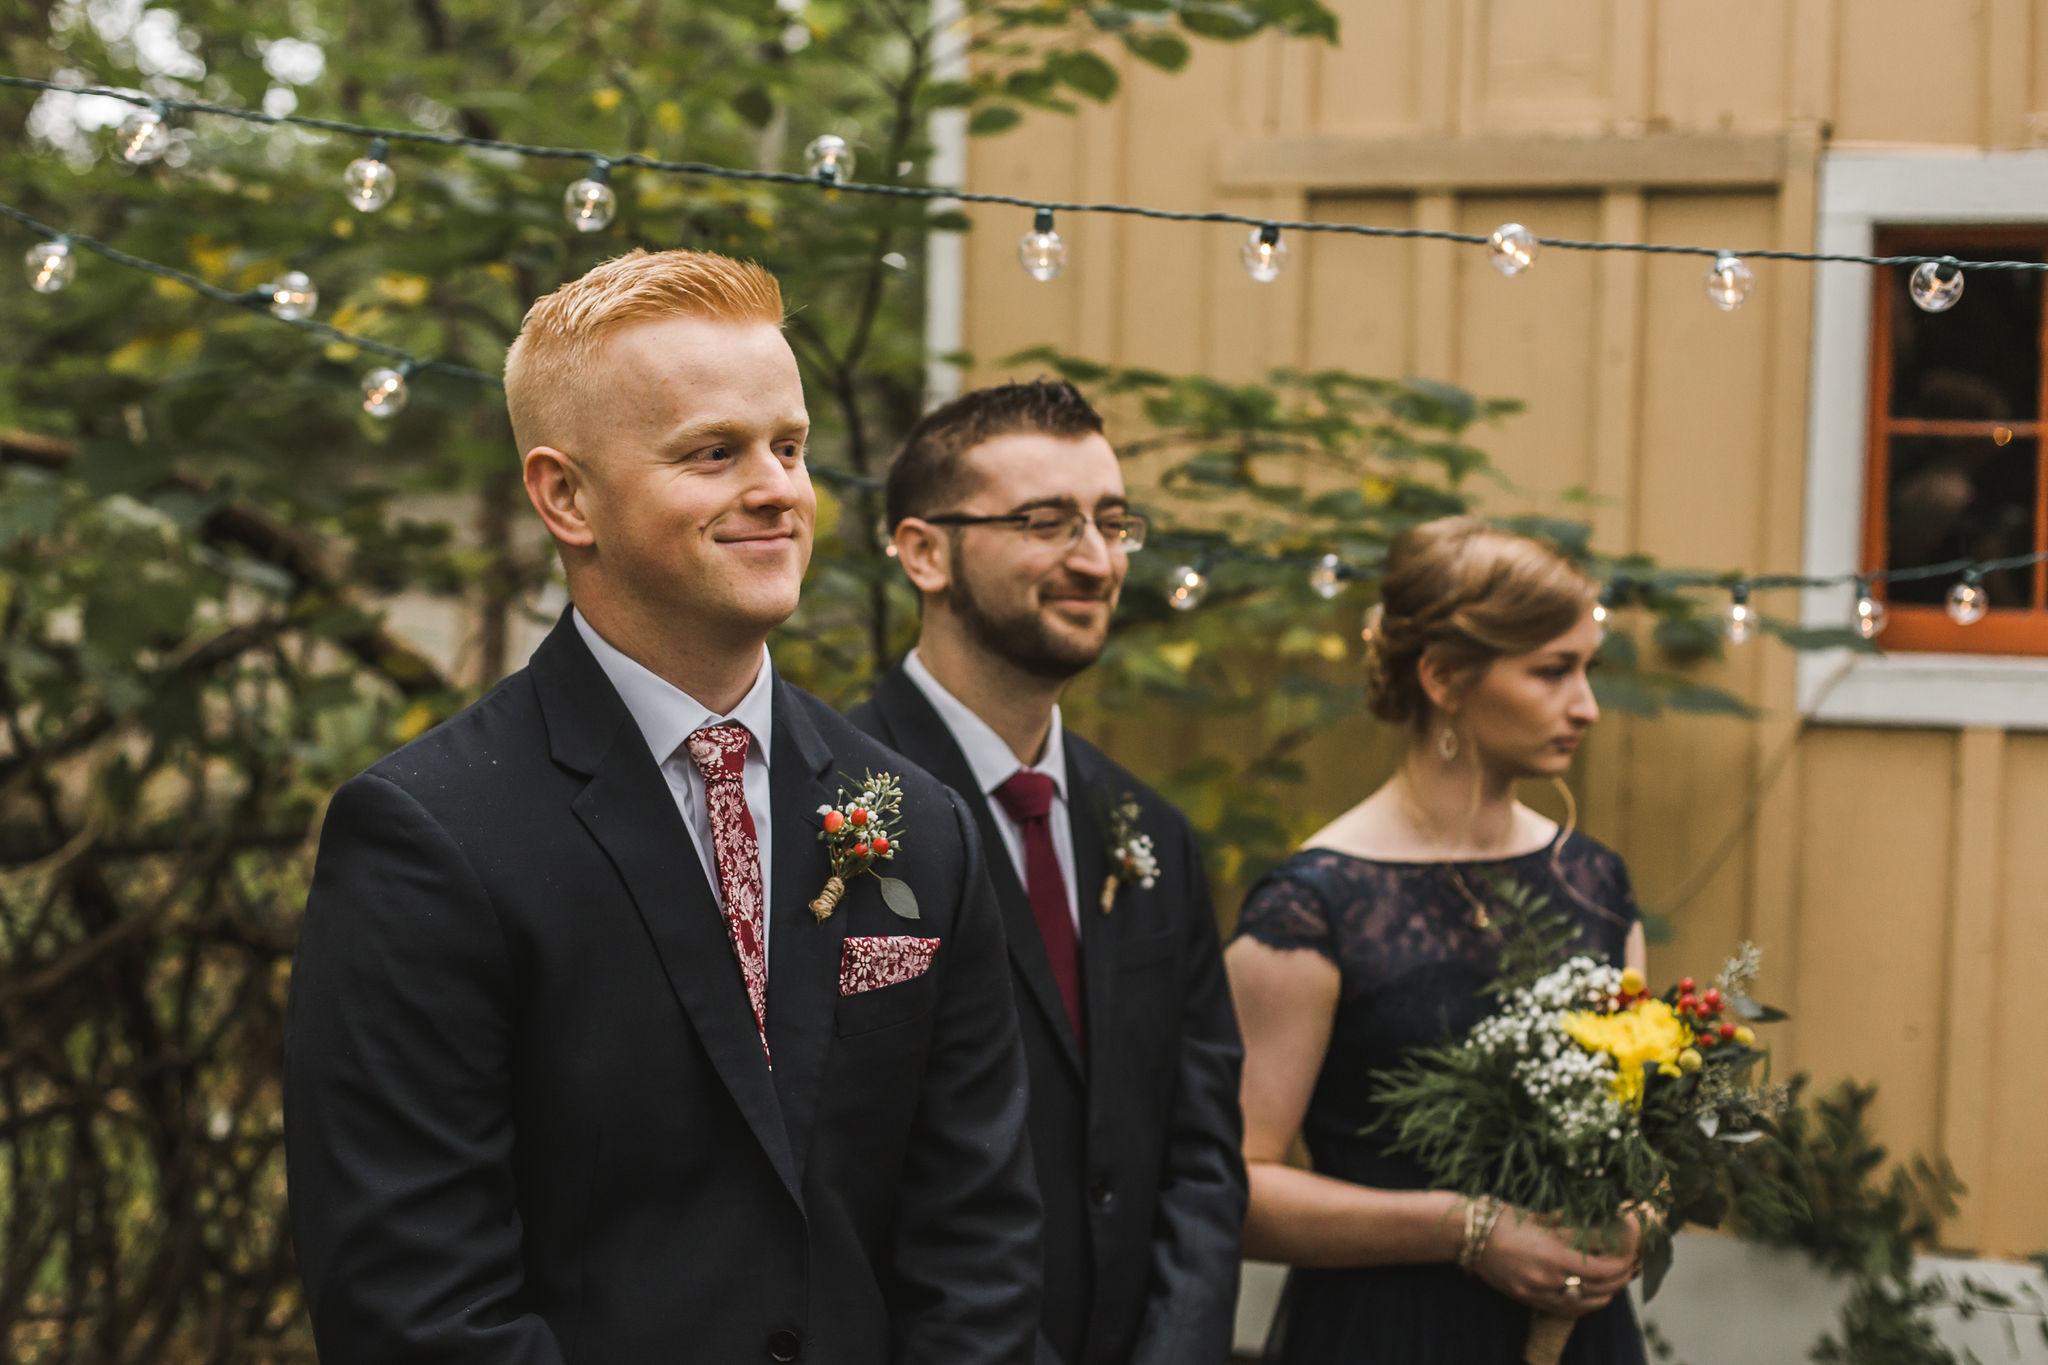 Burgundy Fall Wedding Details Groom